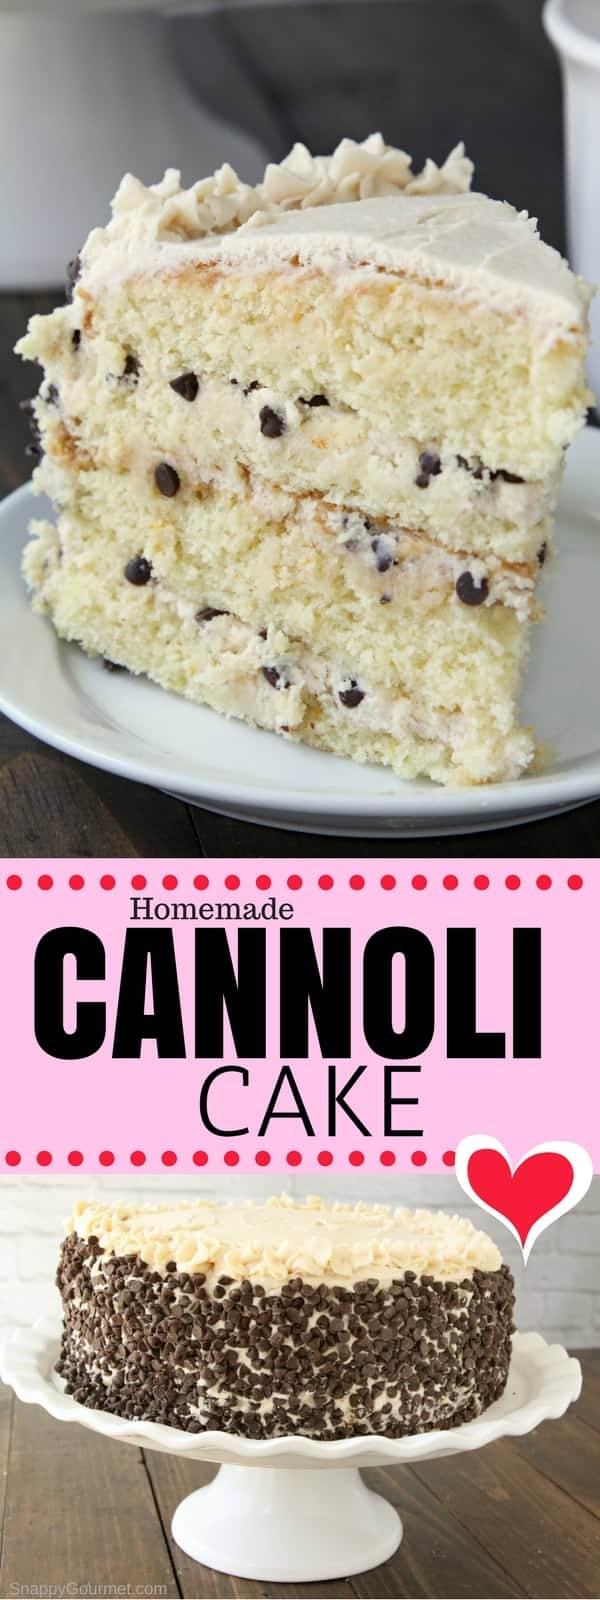 CANNOLI CAKE RECIPE SNAPPY GOURMET